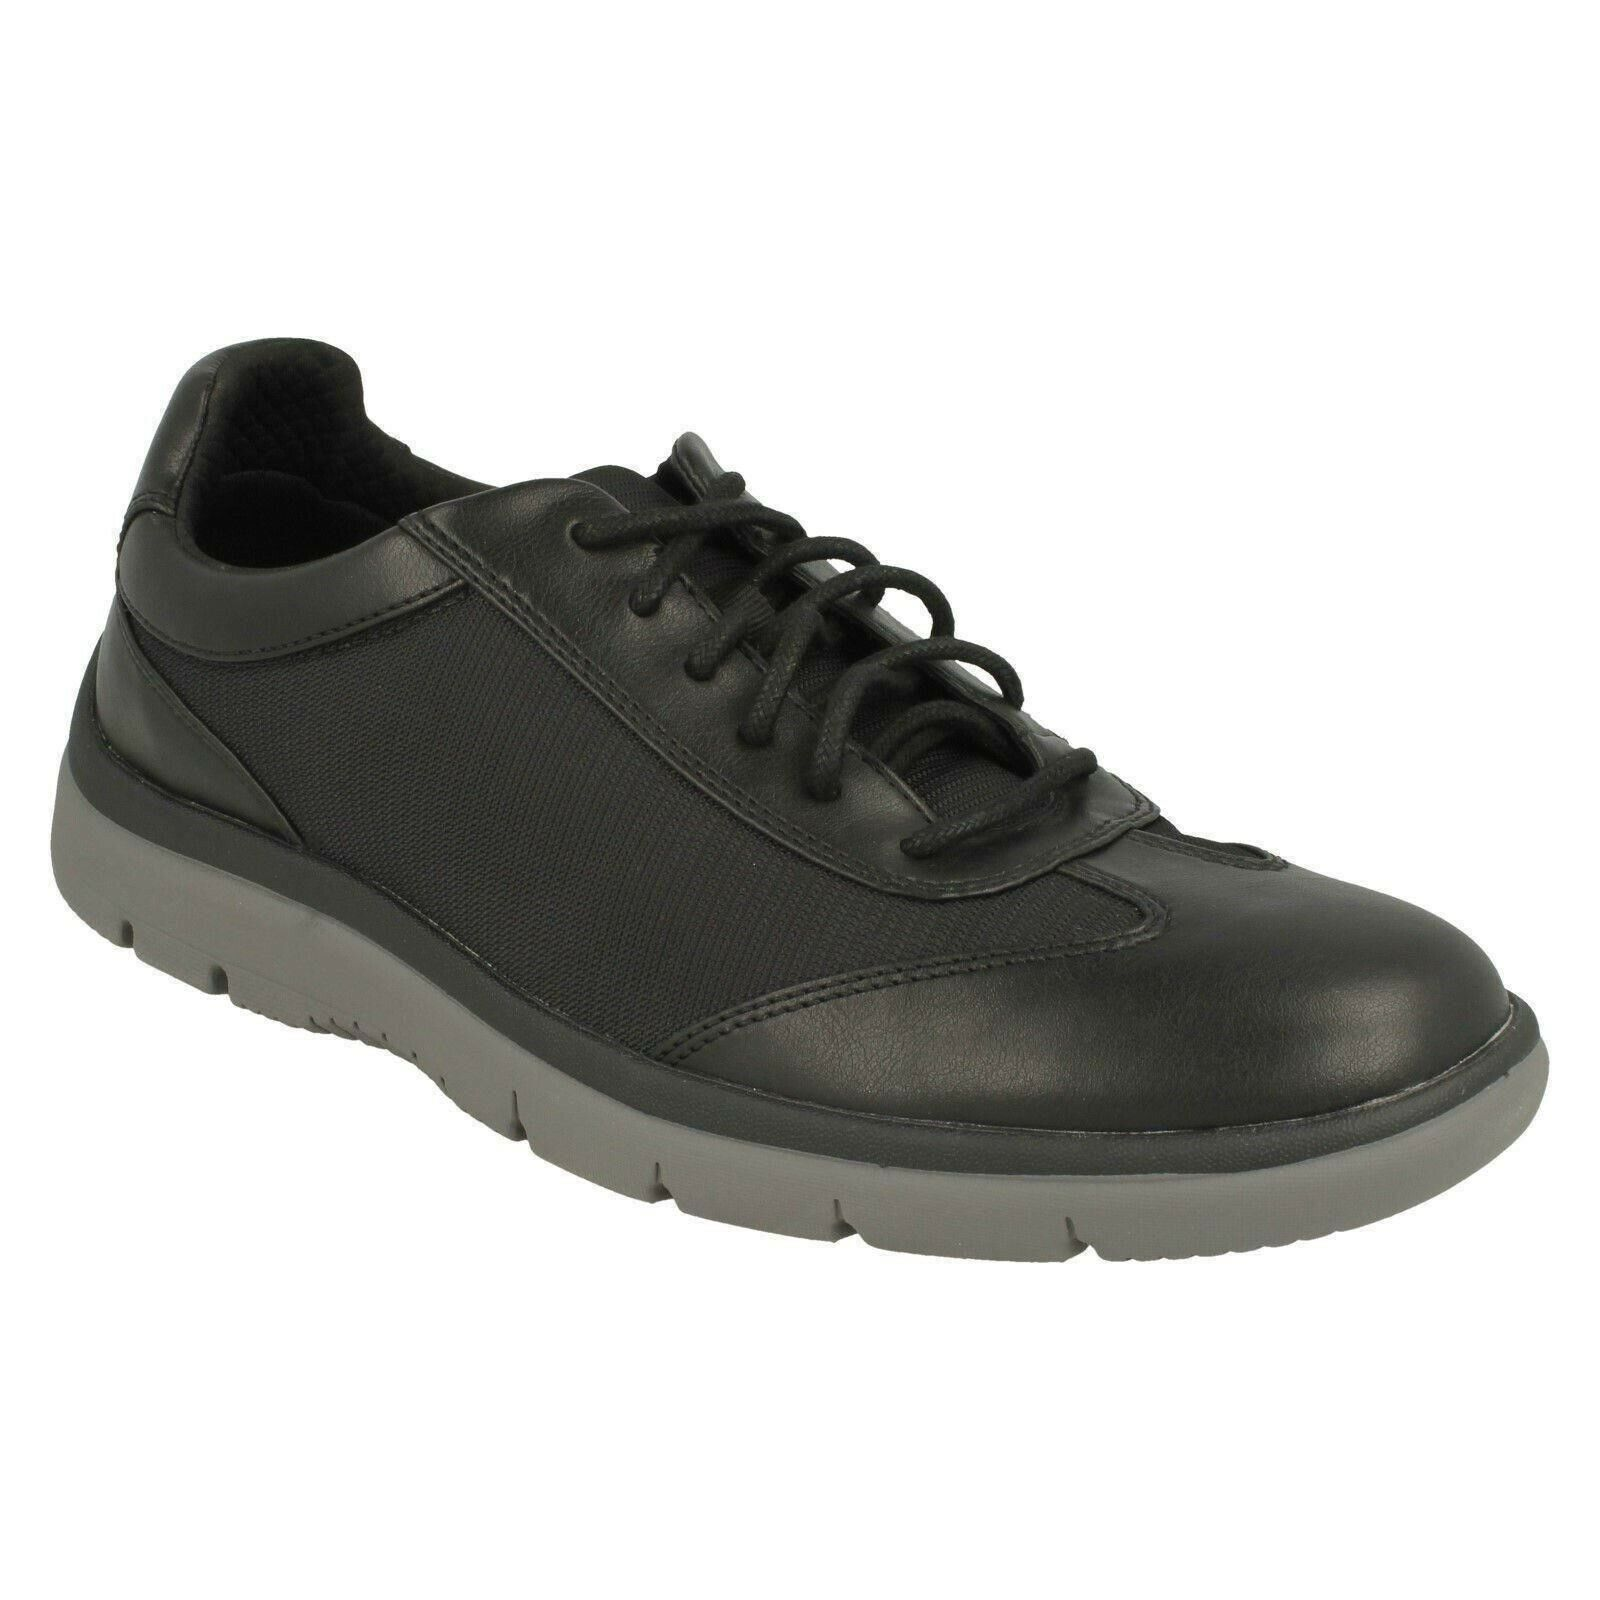 MENS MENS MENS CLARKS LACE UP CLOUDSTEPPERS WALKING TRAINERS SPORTS schuhe TUNSIL RIDGE    | Produktqualität  fd78a4